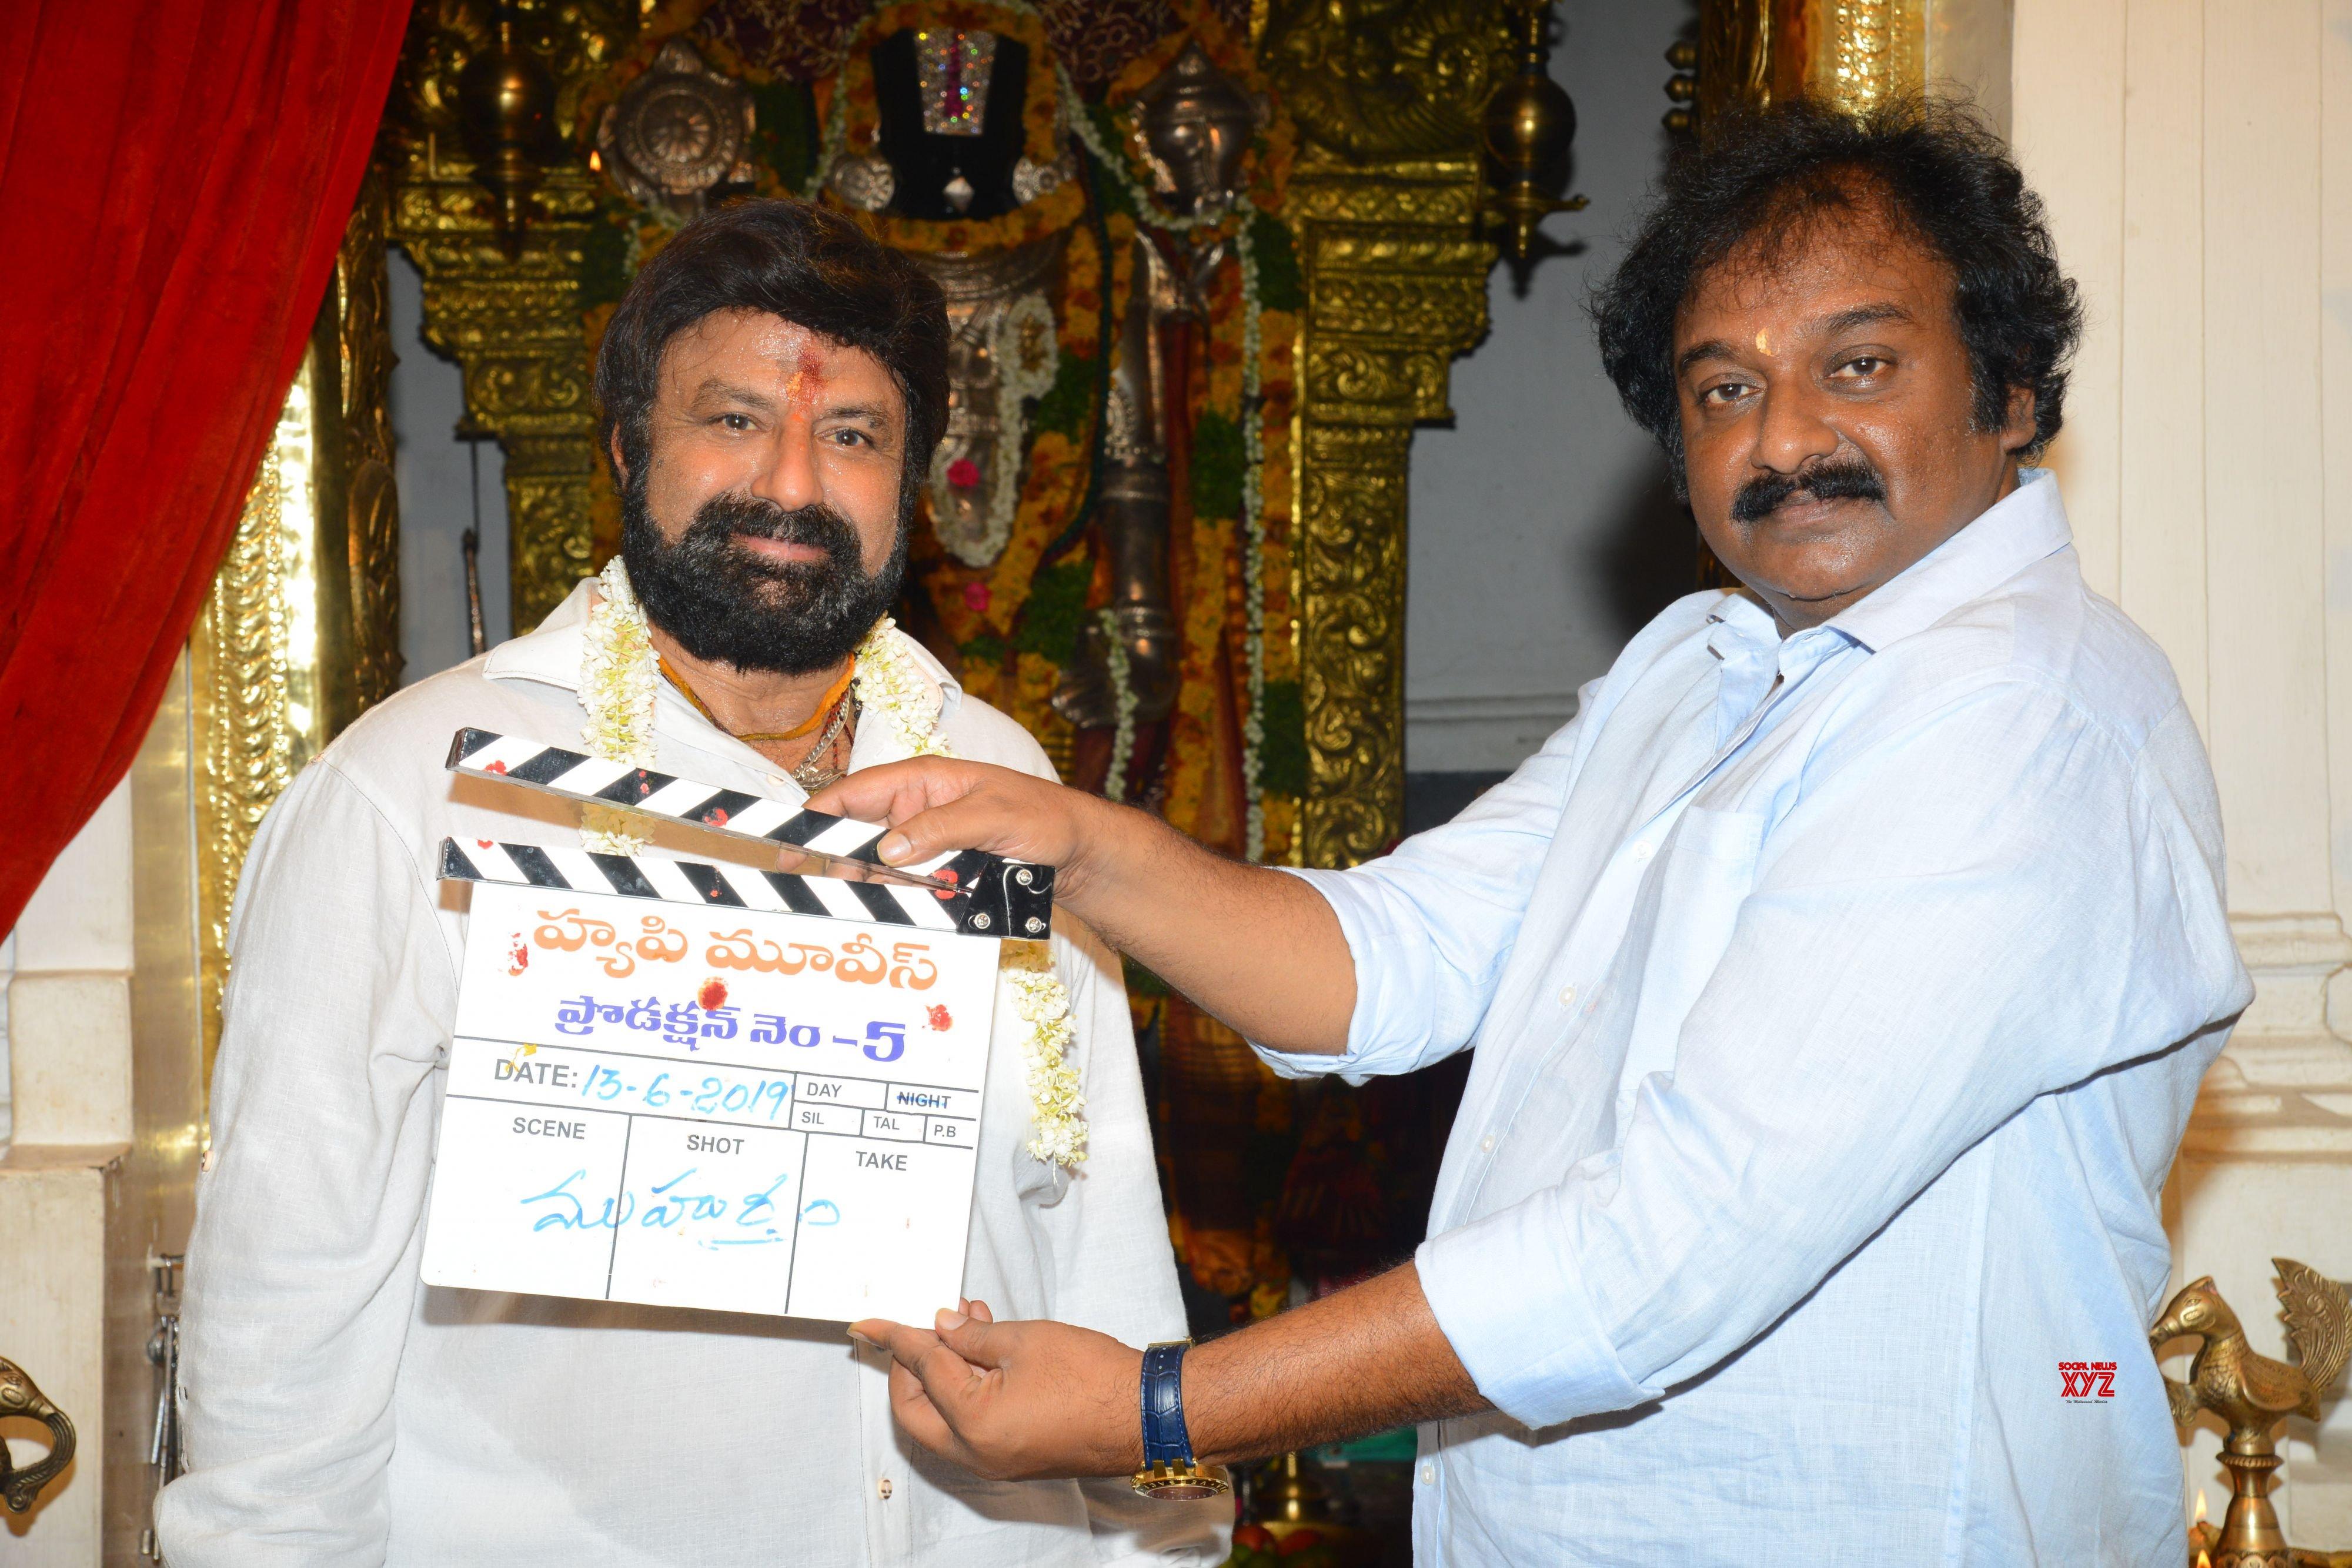 Nandamuri Balakrishna - KS Ravi Kumar - C Kalyan Movie Launch HD Gallery